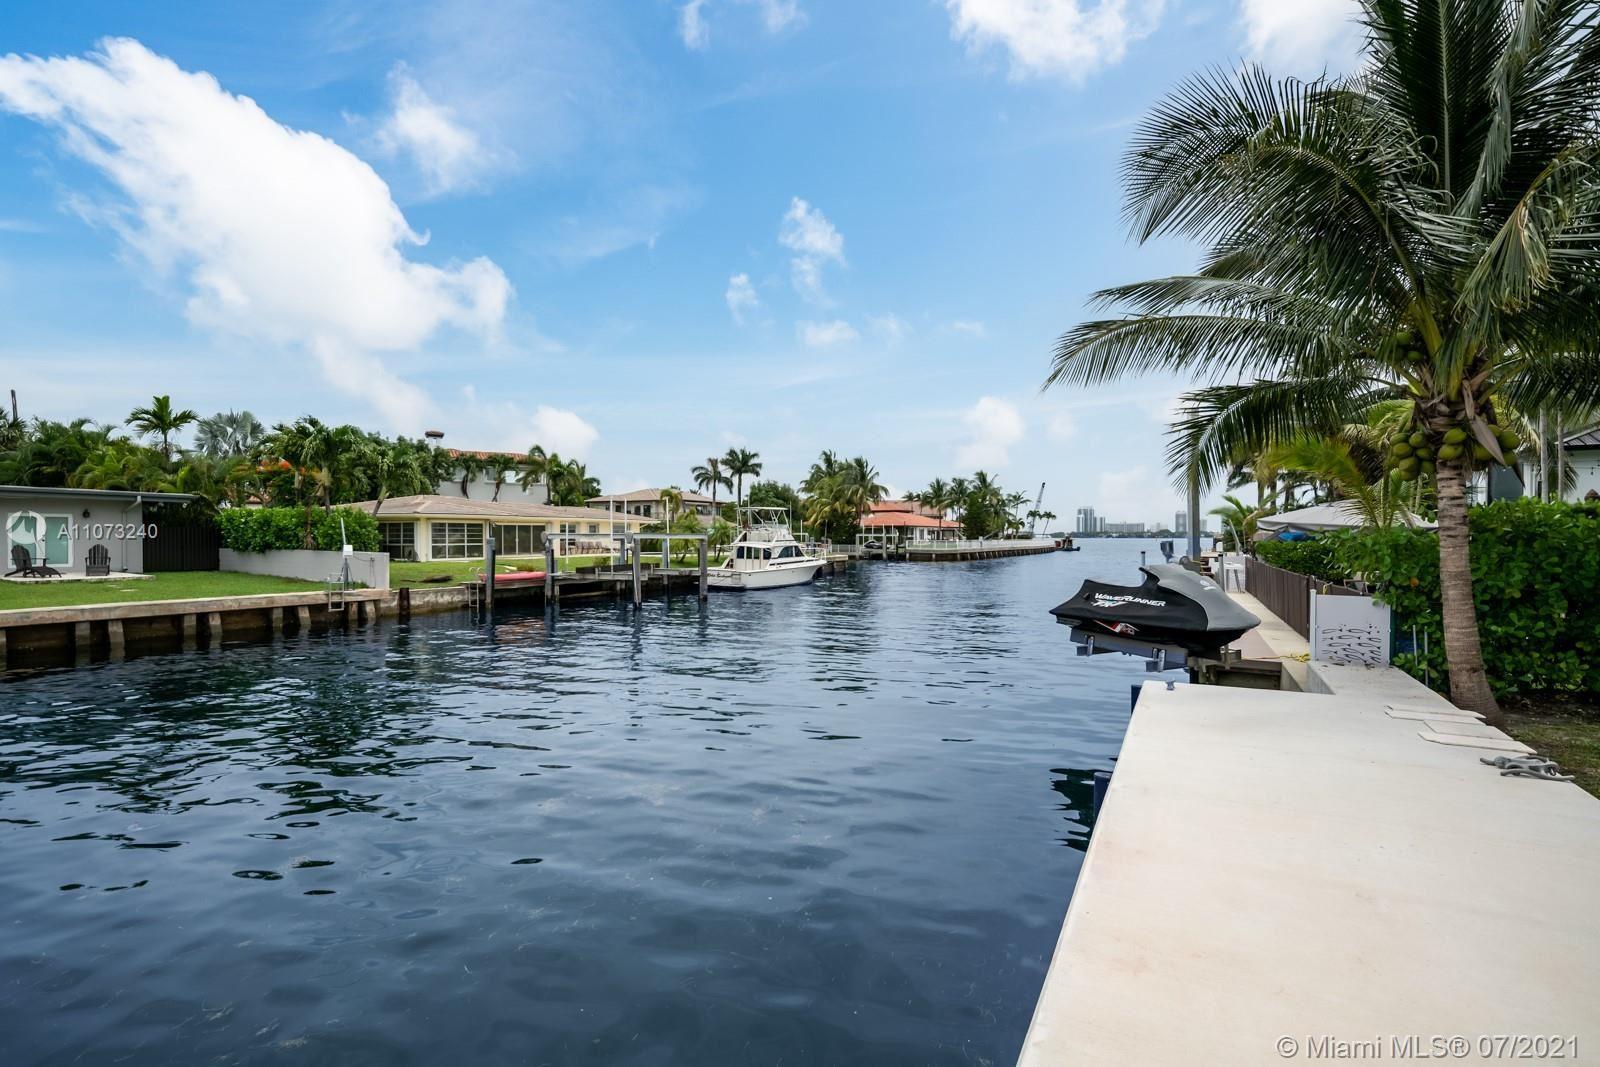 Photo of 2371 Bayview Ln, North Miami, FL 33181 (MLS # A11073240)